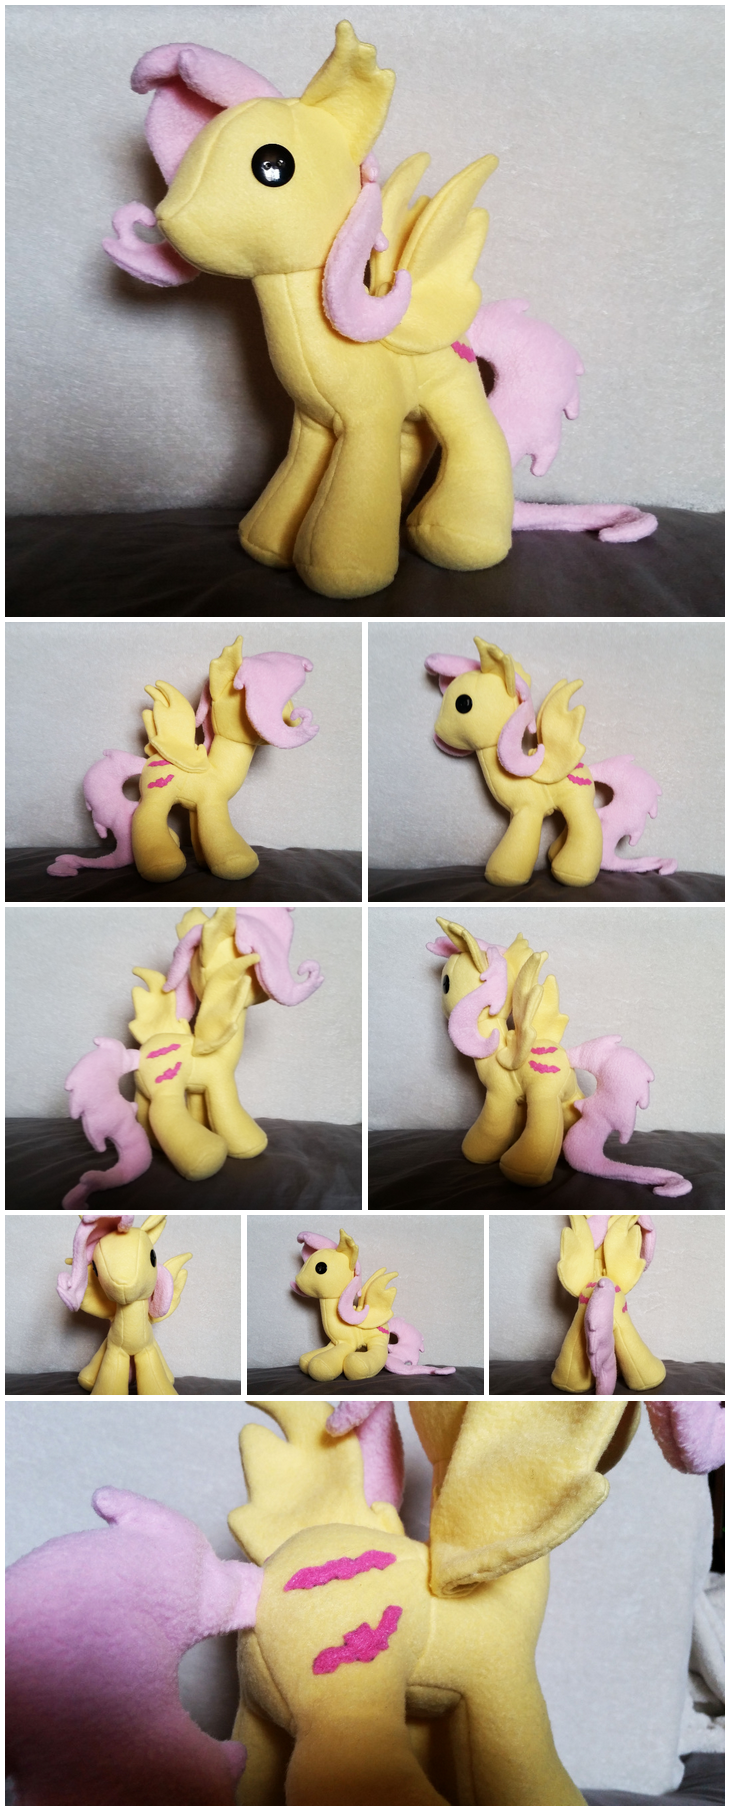 Flutterbat Plush [FOR SALE] by Kimmorz